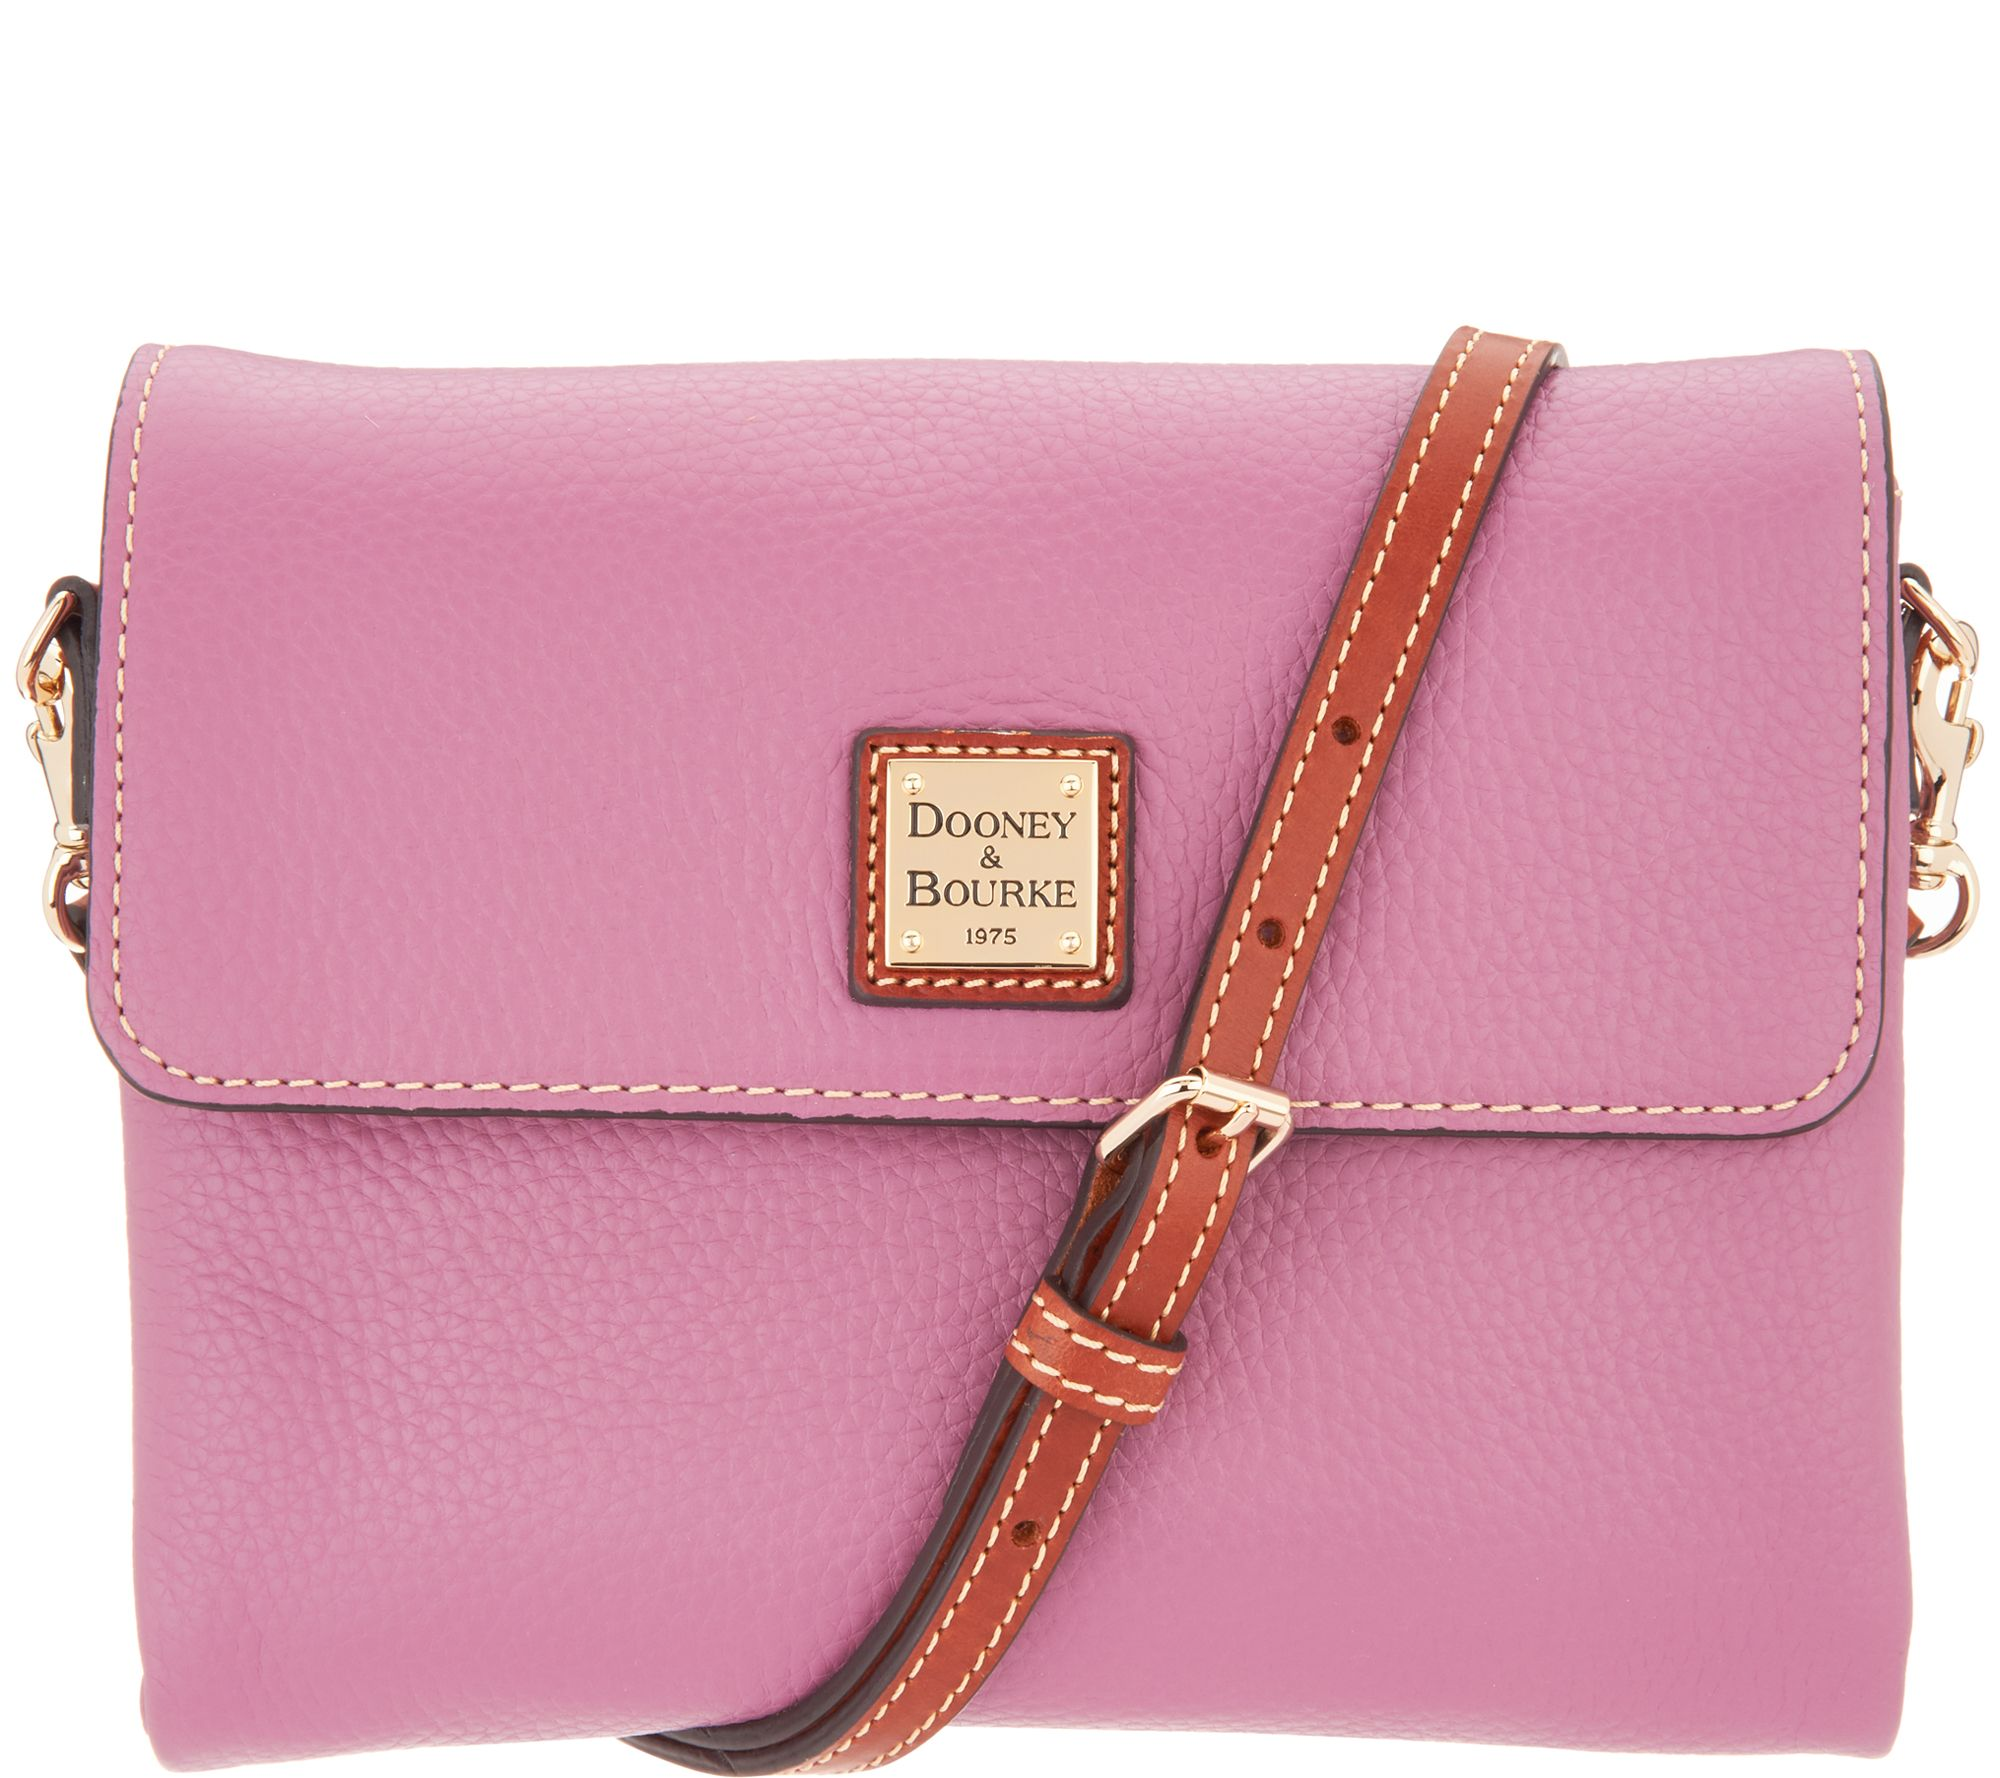 2ca4e9d890c Dooney   Bourke Pebble Leather Crossbody Handbag - Hunter - Page 1 — QVC.com